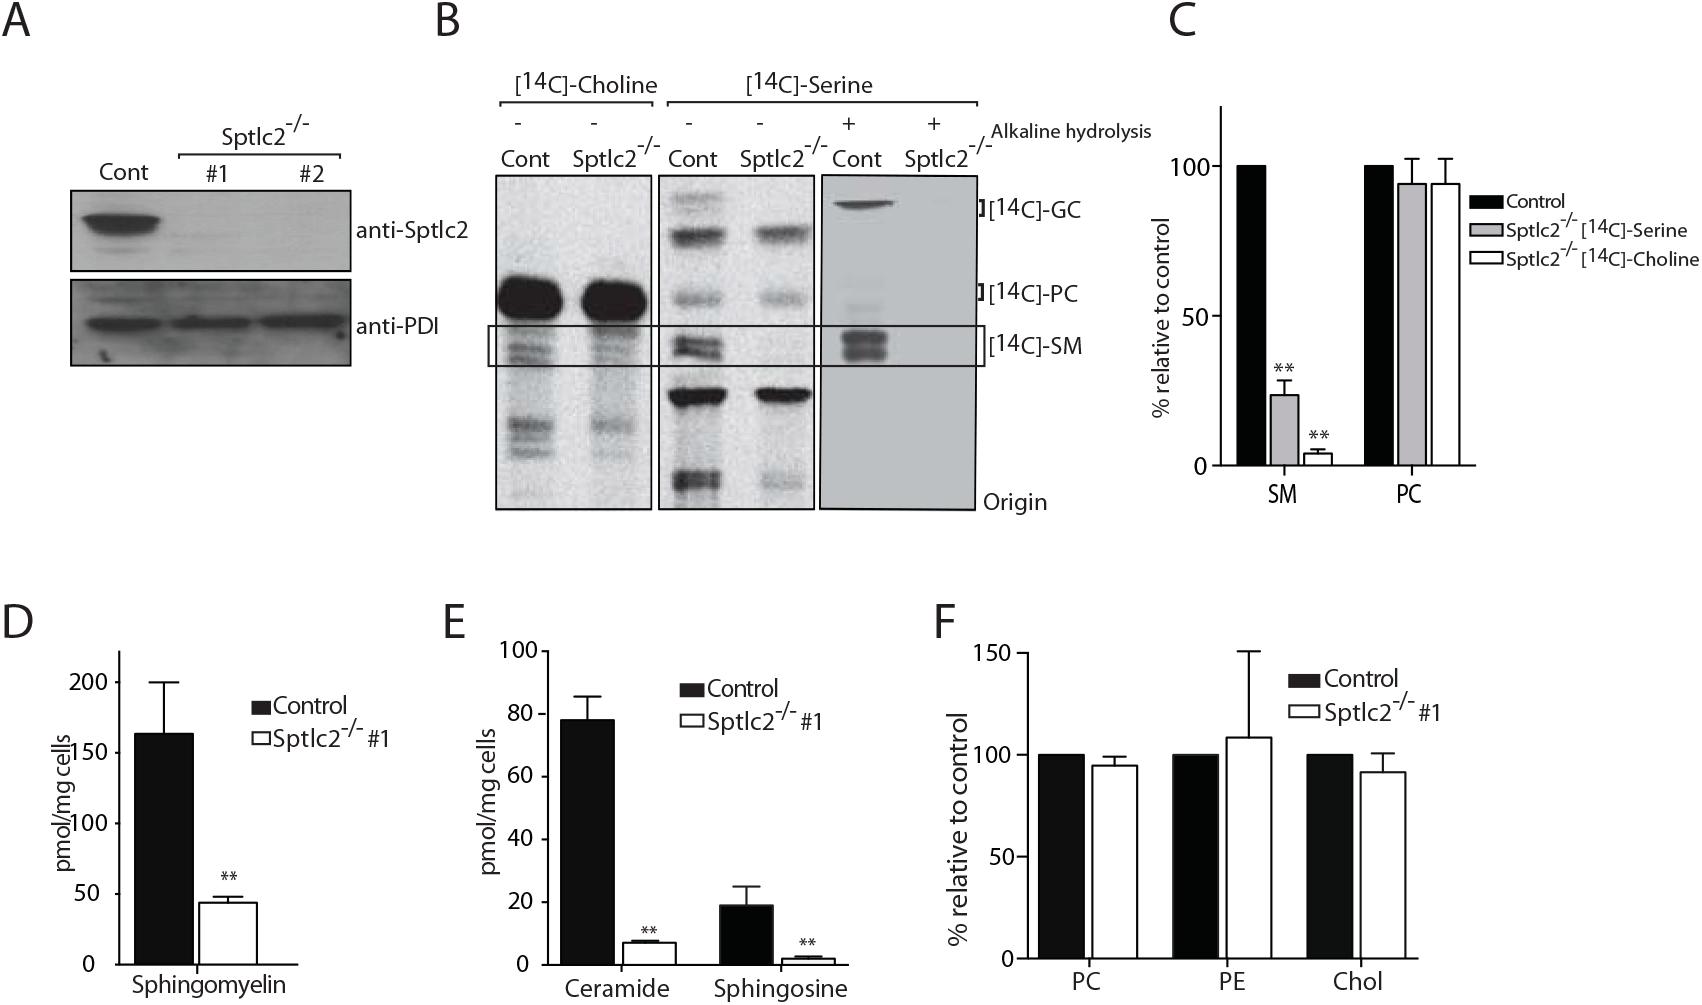 CRISPR/Cas9-mediated deletion of Sptlc2 in DC2.4 cells.